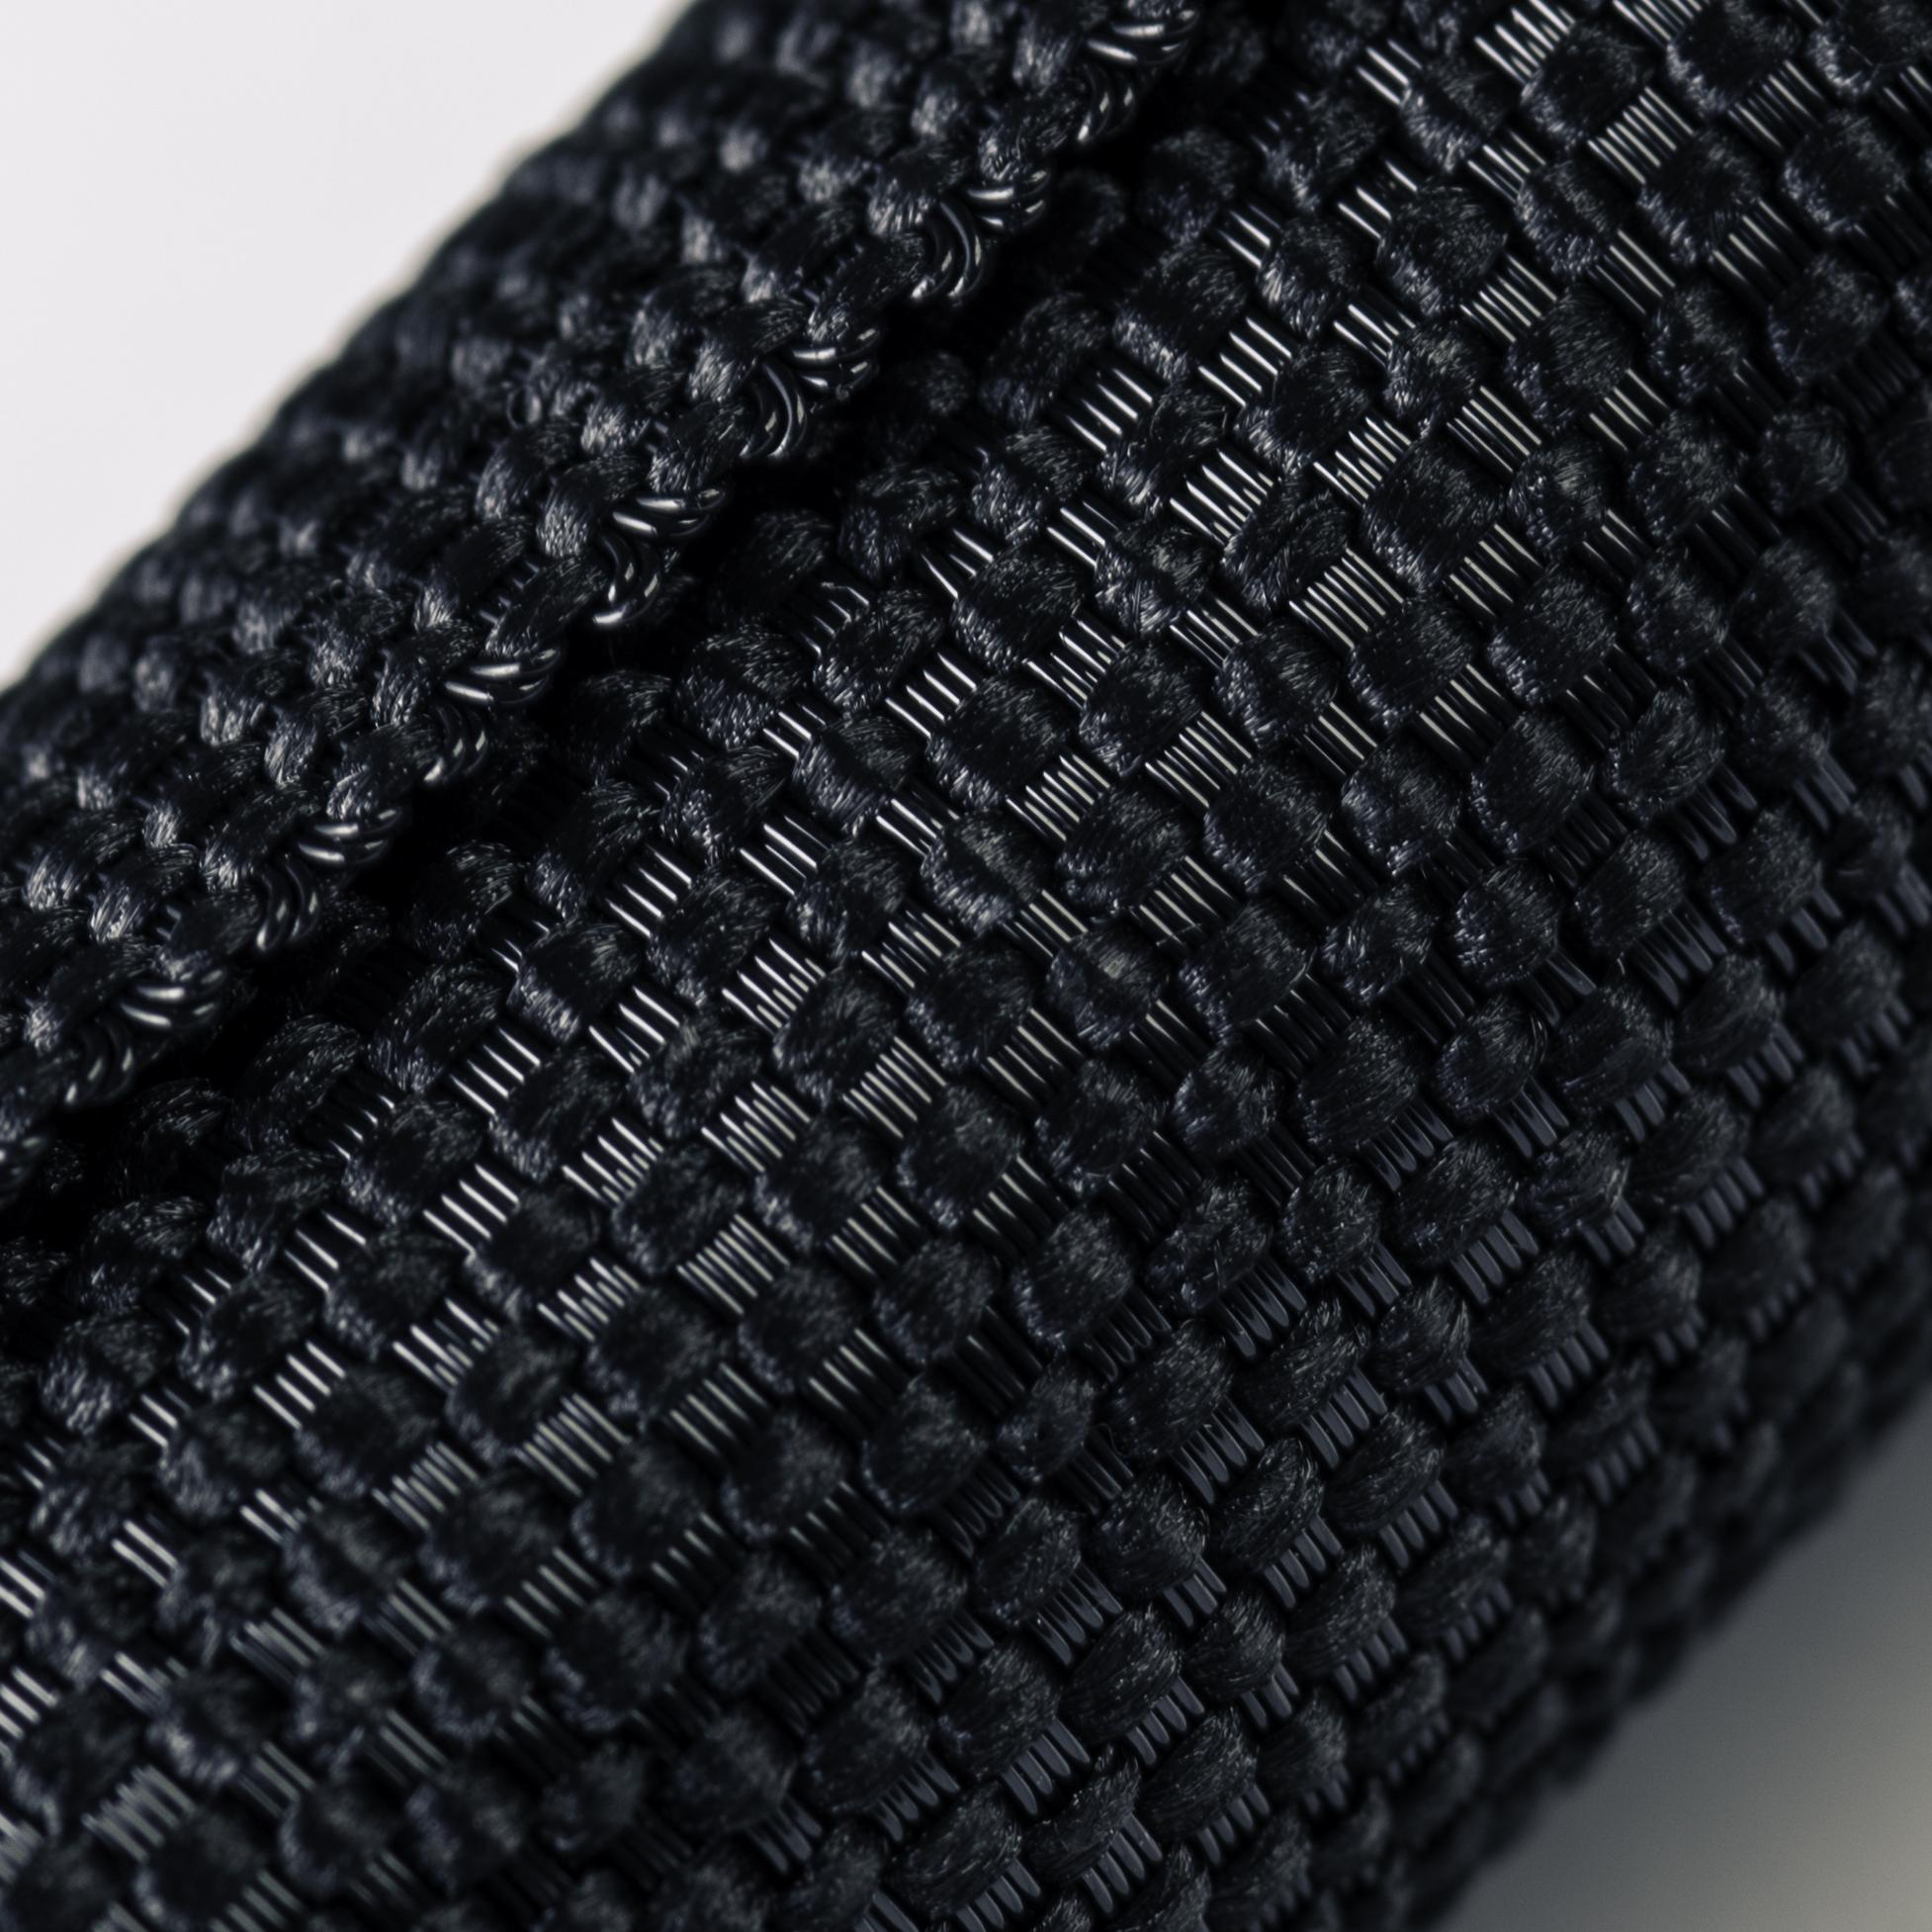 F6 Woven Wrap - Carbon!